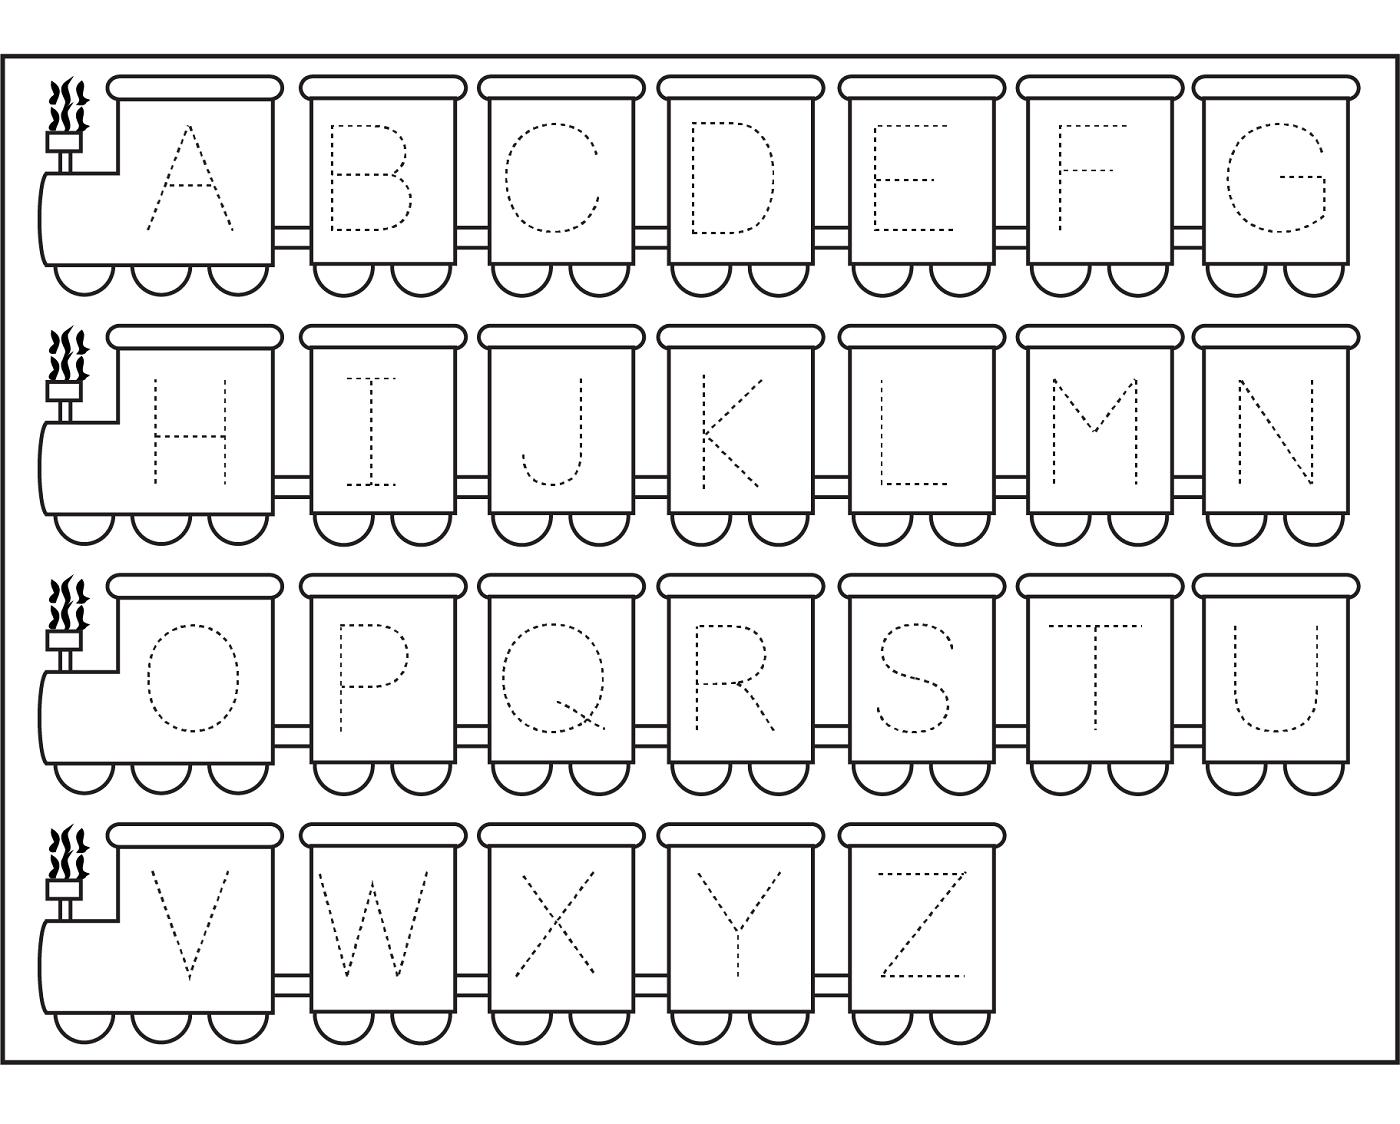 Worksheet  Alphabet Worksheets For Preschoolers  Grass Fedjp